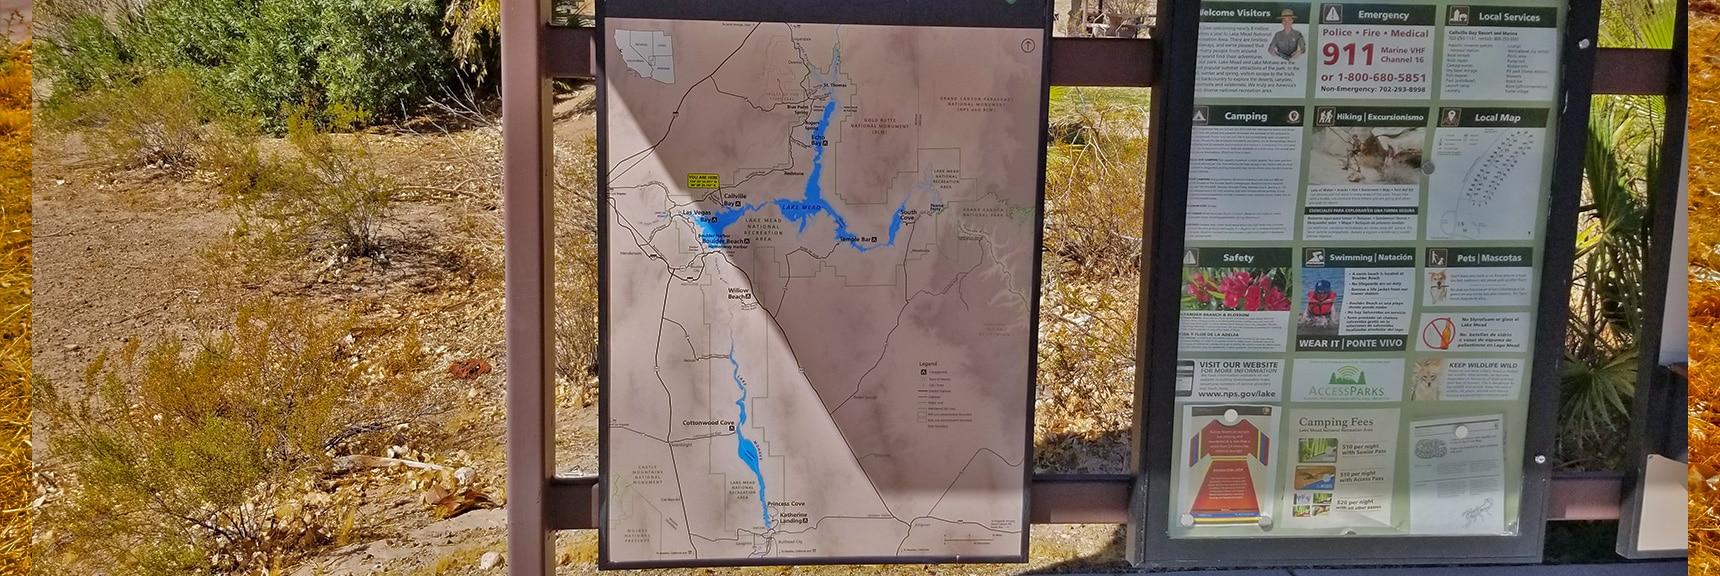 Lake Mead Area Map   Callville Summit Trail   Lake Mead National Recreation Area, Nevada